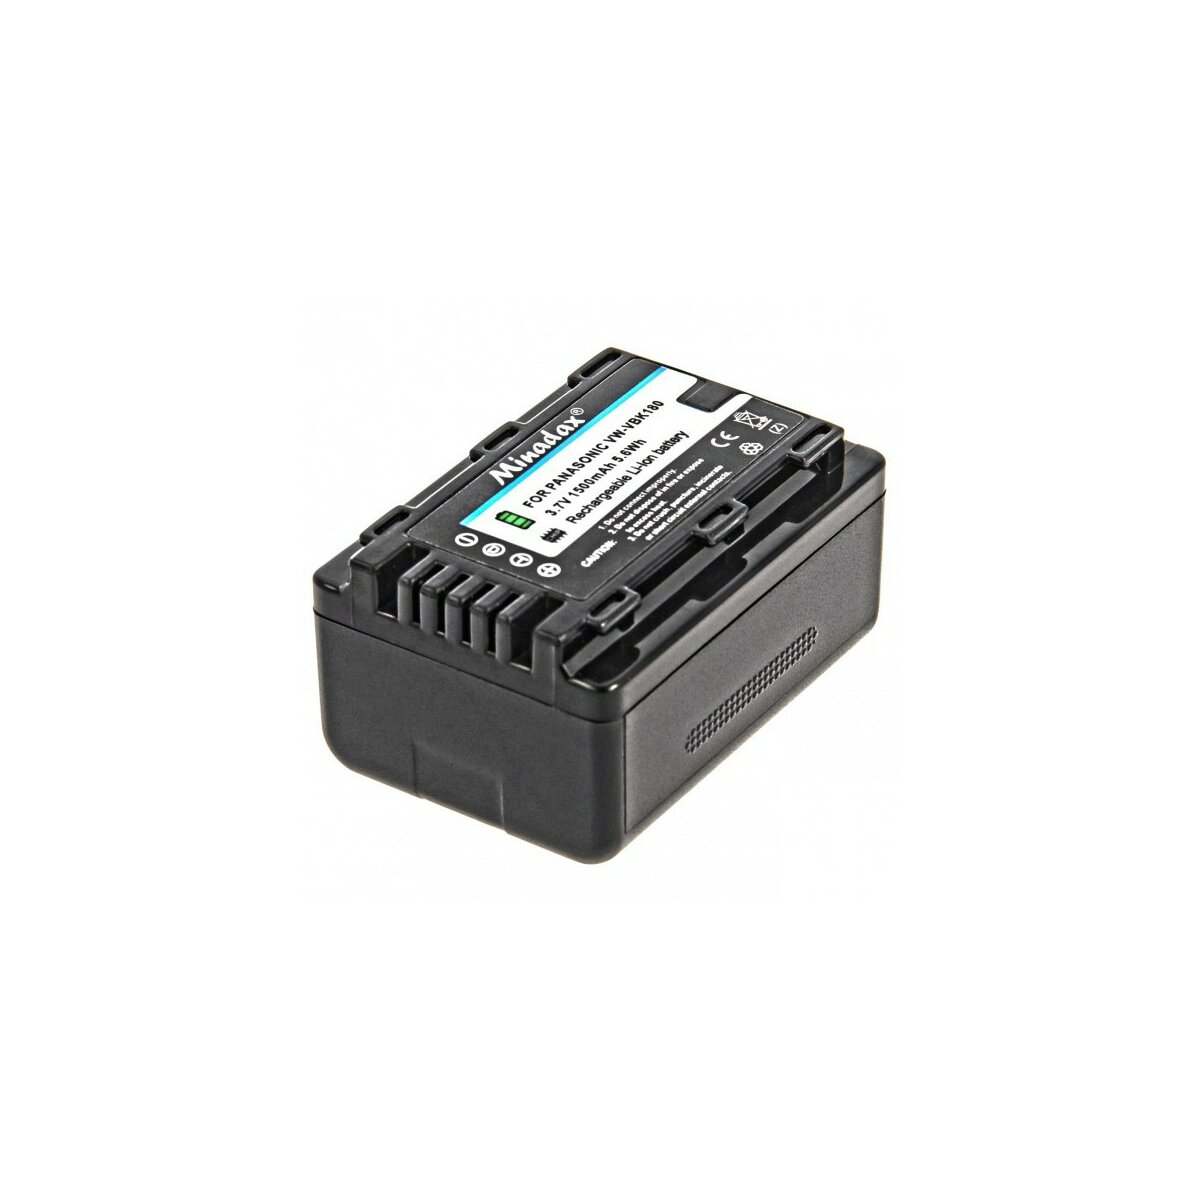 Minadax® Qualitaetsakku mit echten 1500 mAh fuer Panasonic HDC HS60 TM60 SD66 SDR H85 T50 S50, wie VW VBK180 - Intelligentes Akkusystem mit Chip